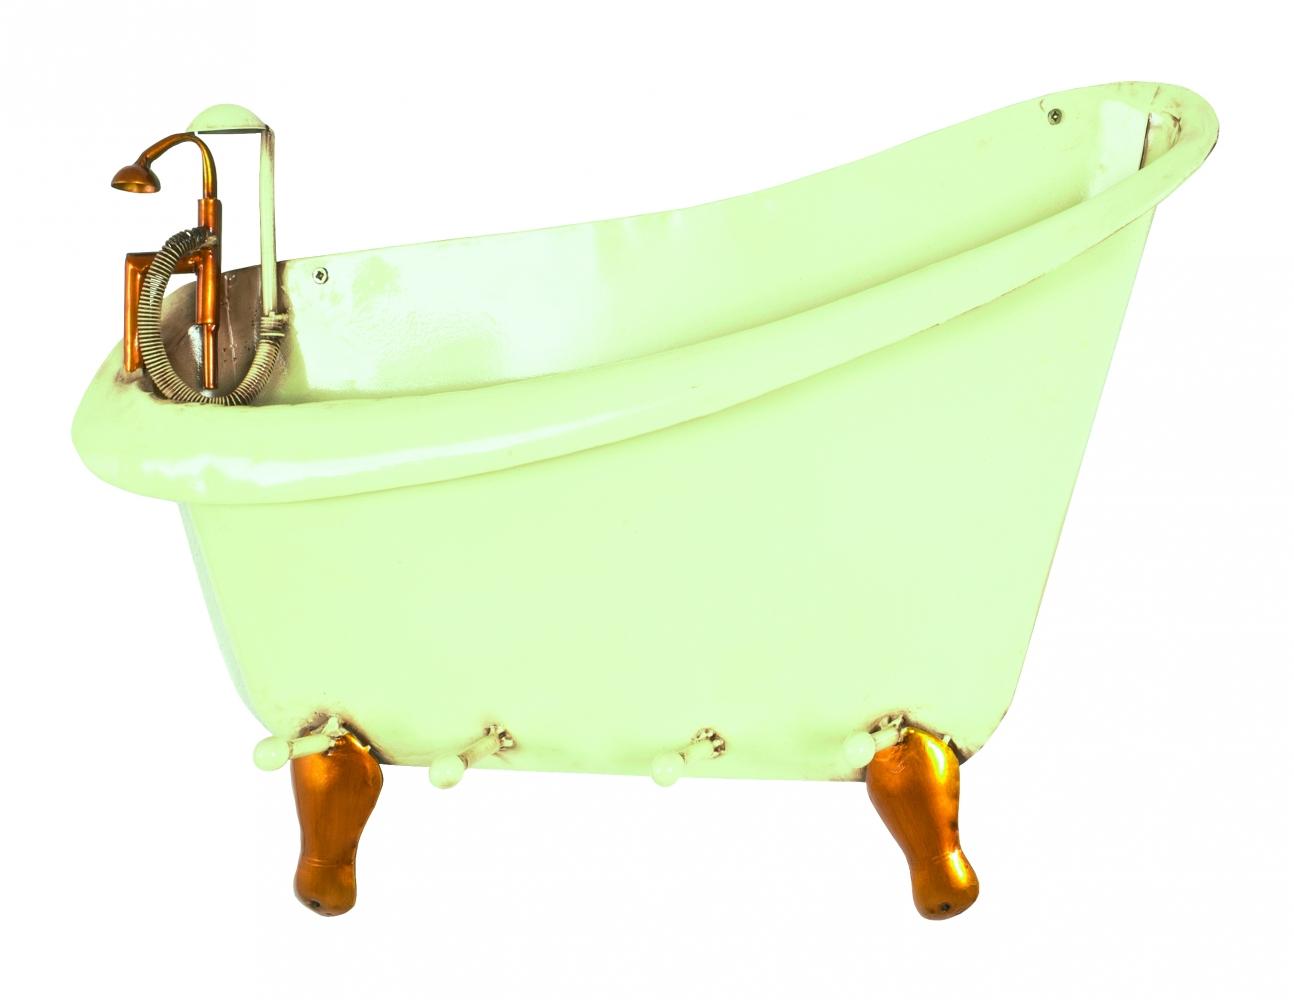 Nástěnný věšák Bathort, 54 cm